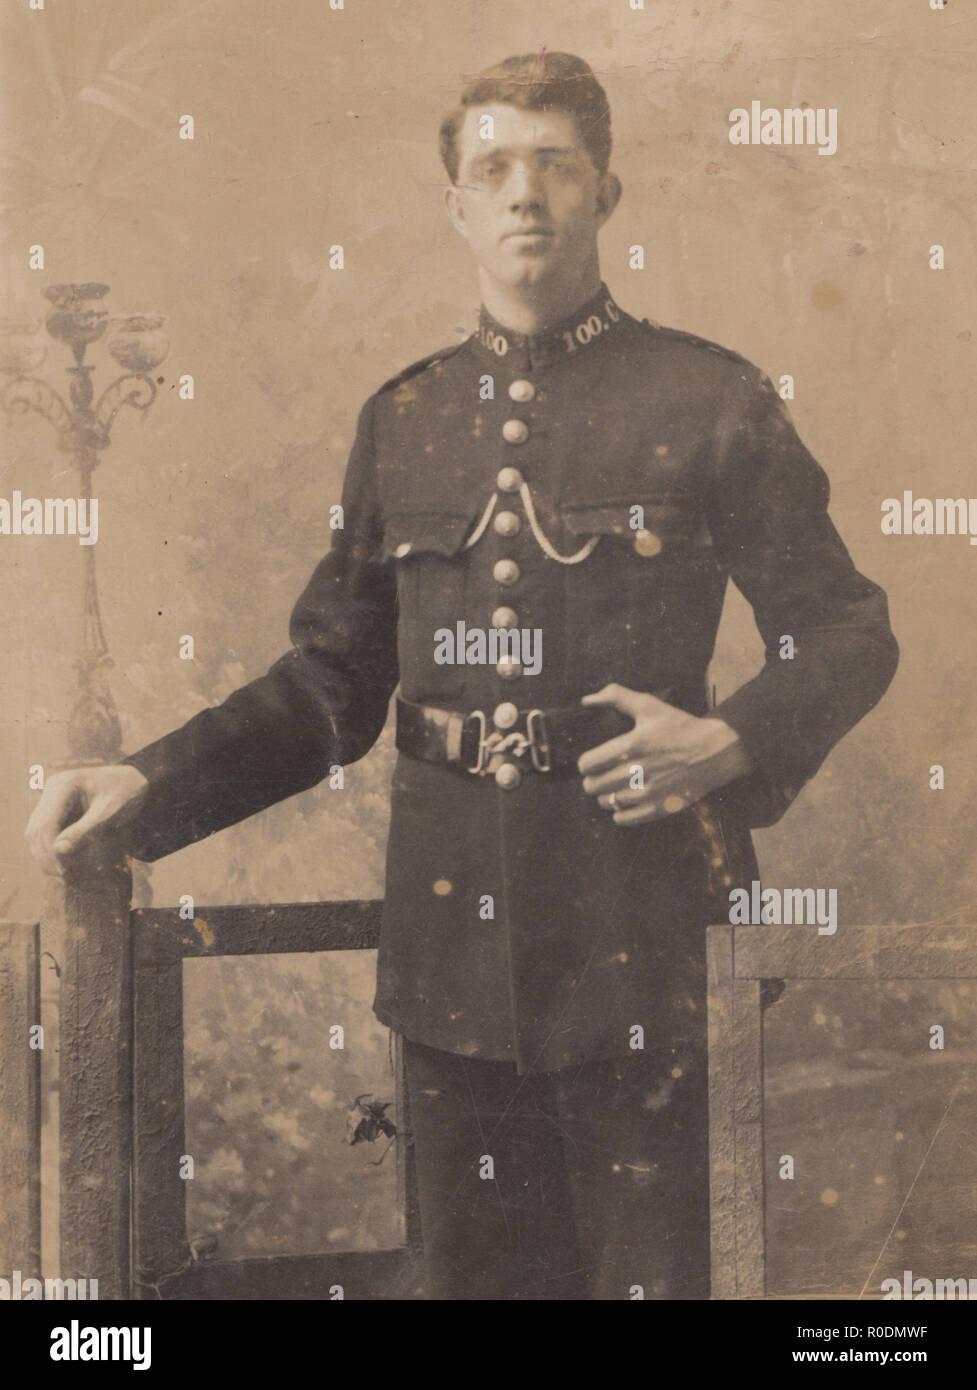 Vintage Photographic Postcard of a British Police Constable. Collar No 100.C - Stock Image